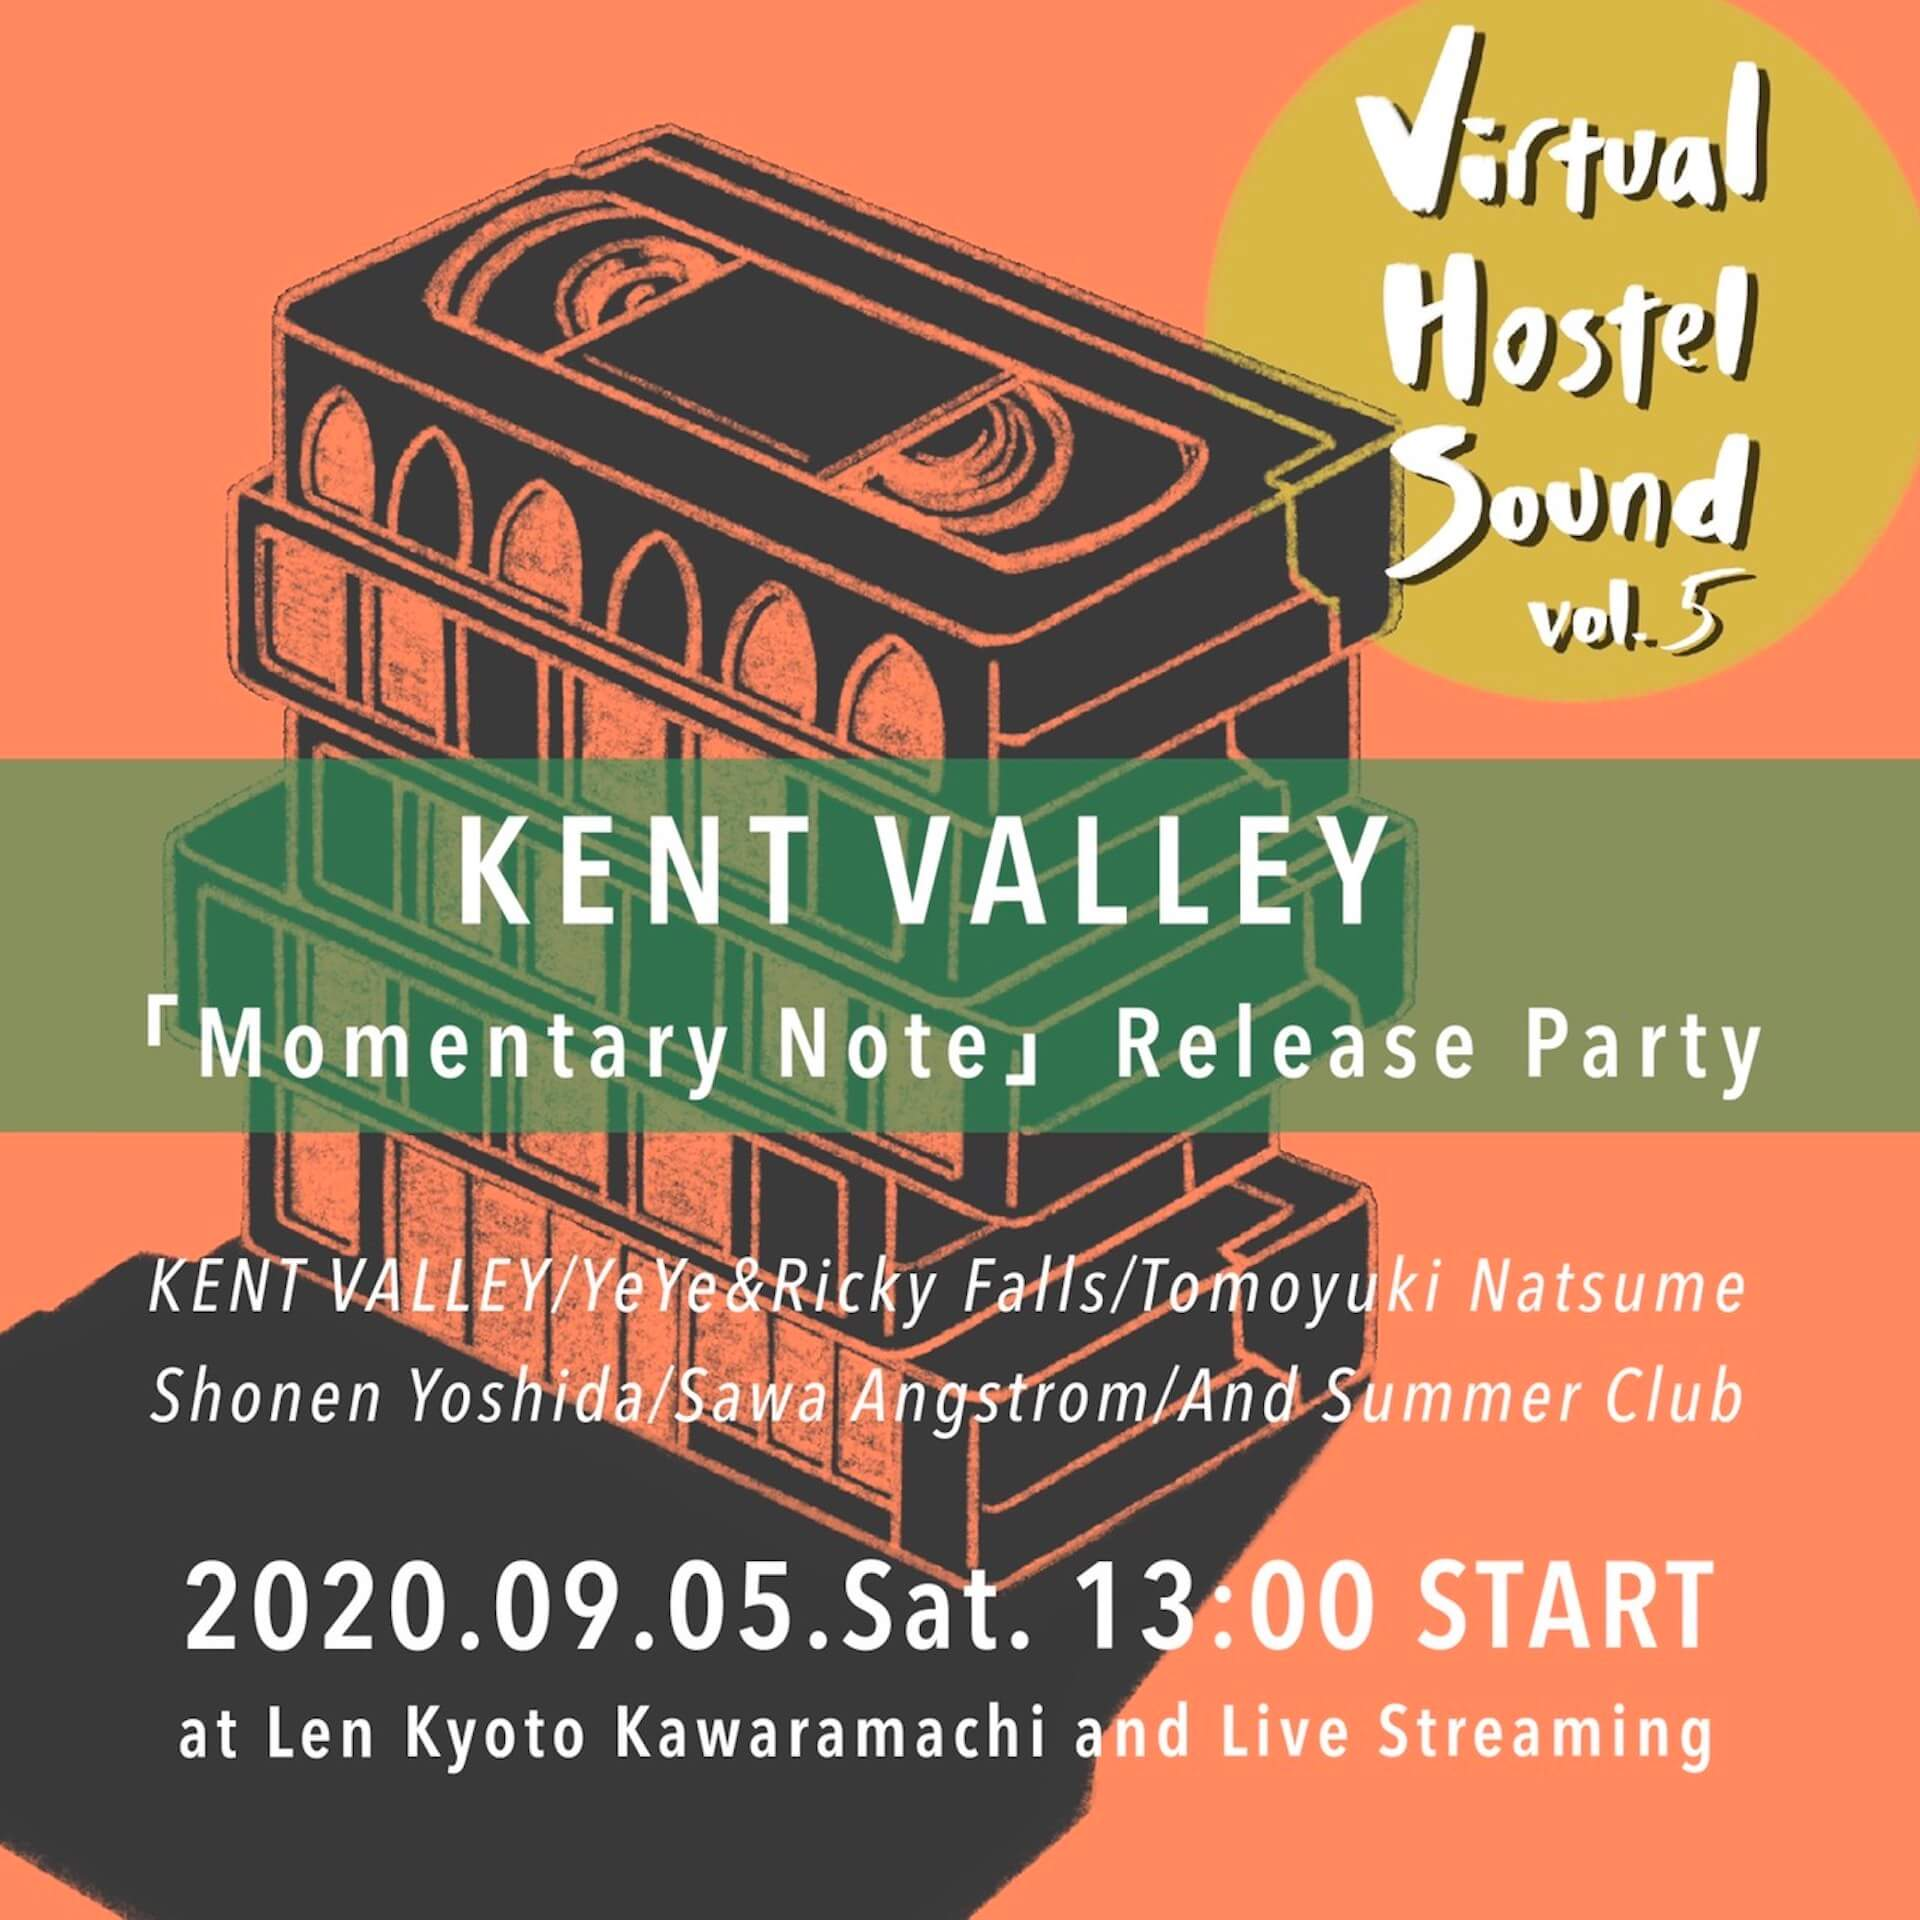 KENT VALLEY待望のミニアルバム『Momentary Note』がリリース!夏目知幸ら参加のレコ発イベントも京都Lenで開催決定 music200819_kentvalley_02